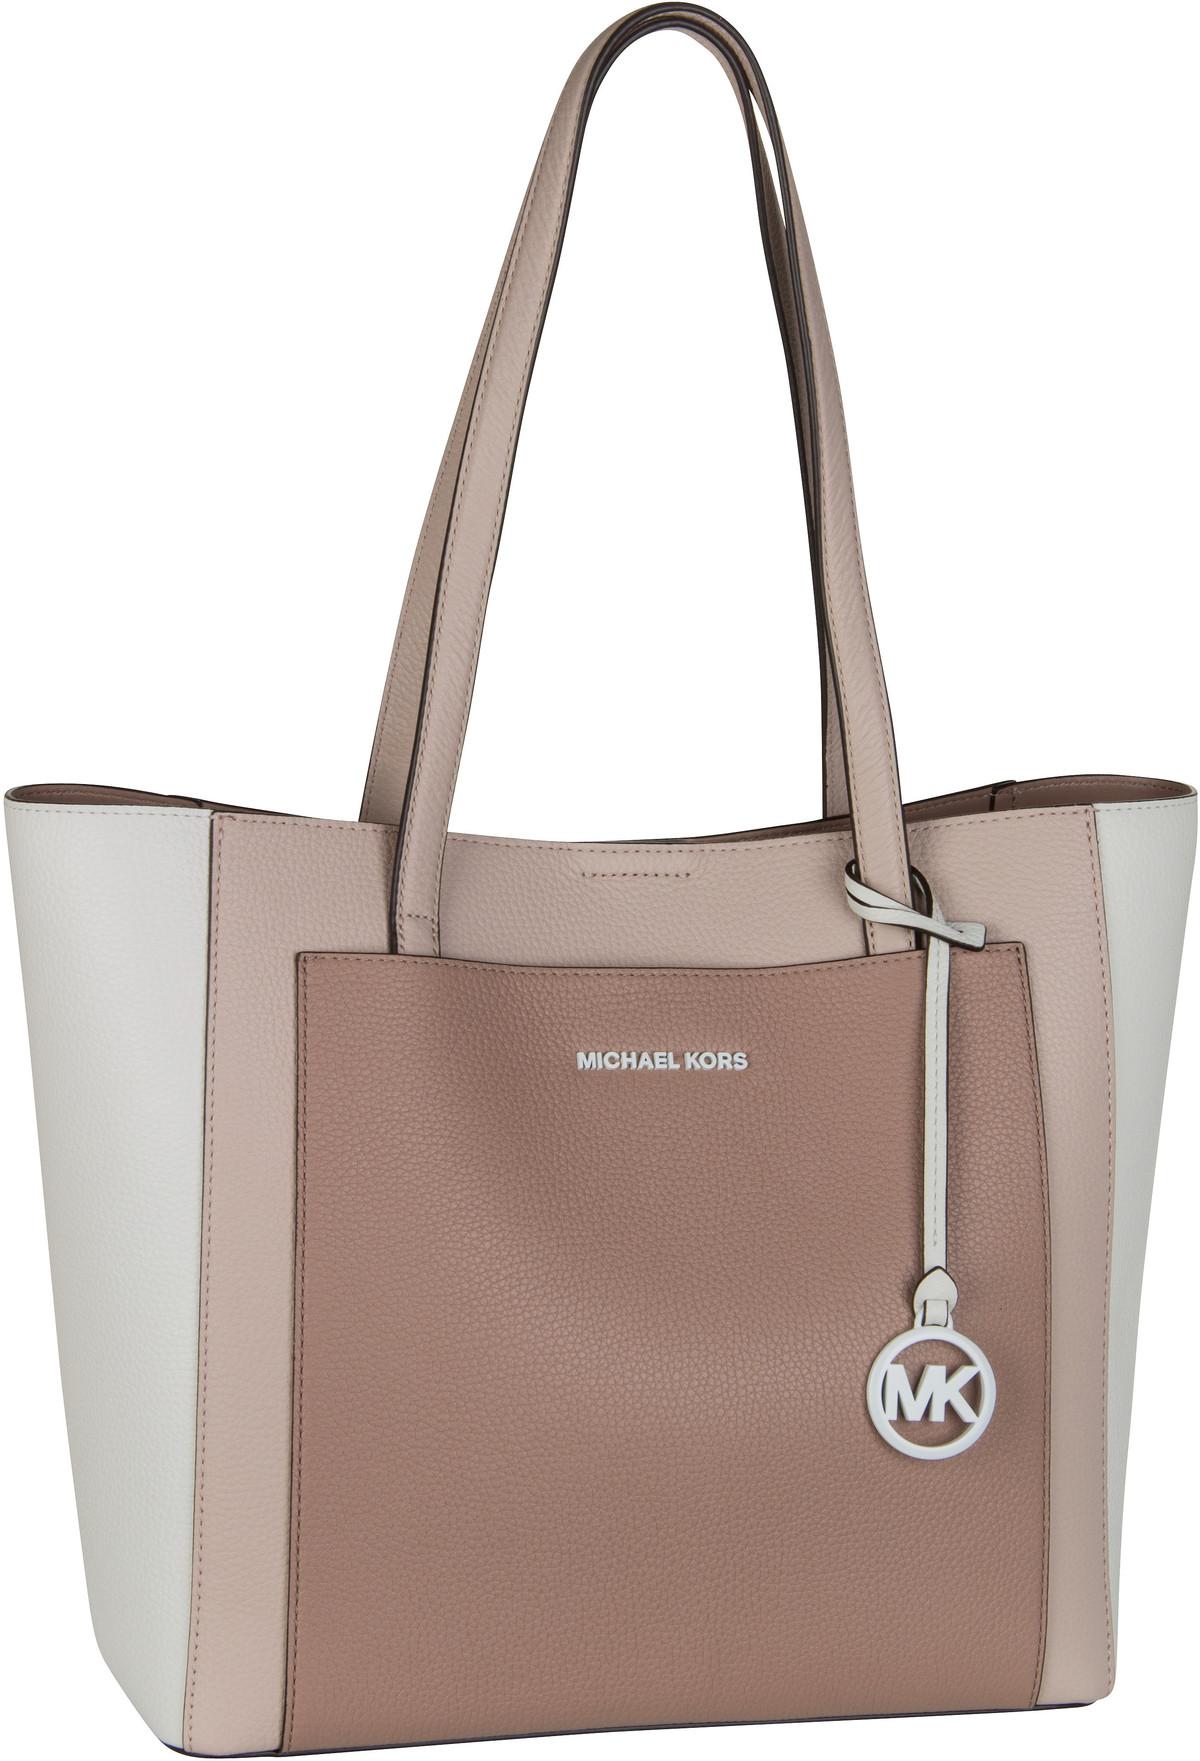 Michael Kors Handtasche Gemma Large Pocket Tote Soft Pink/Fawn